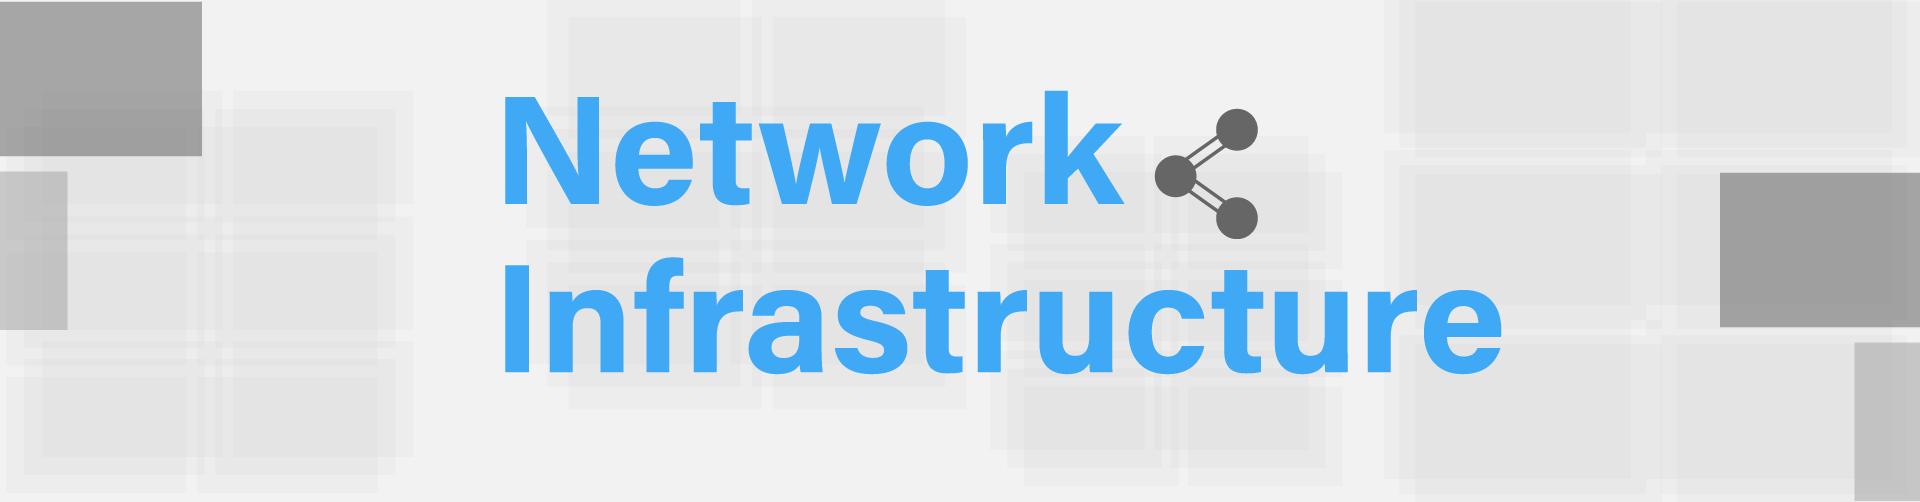 Network-Infrastructure1